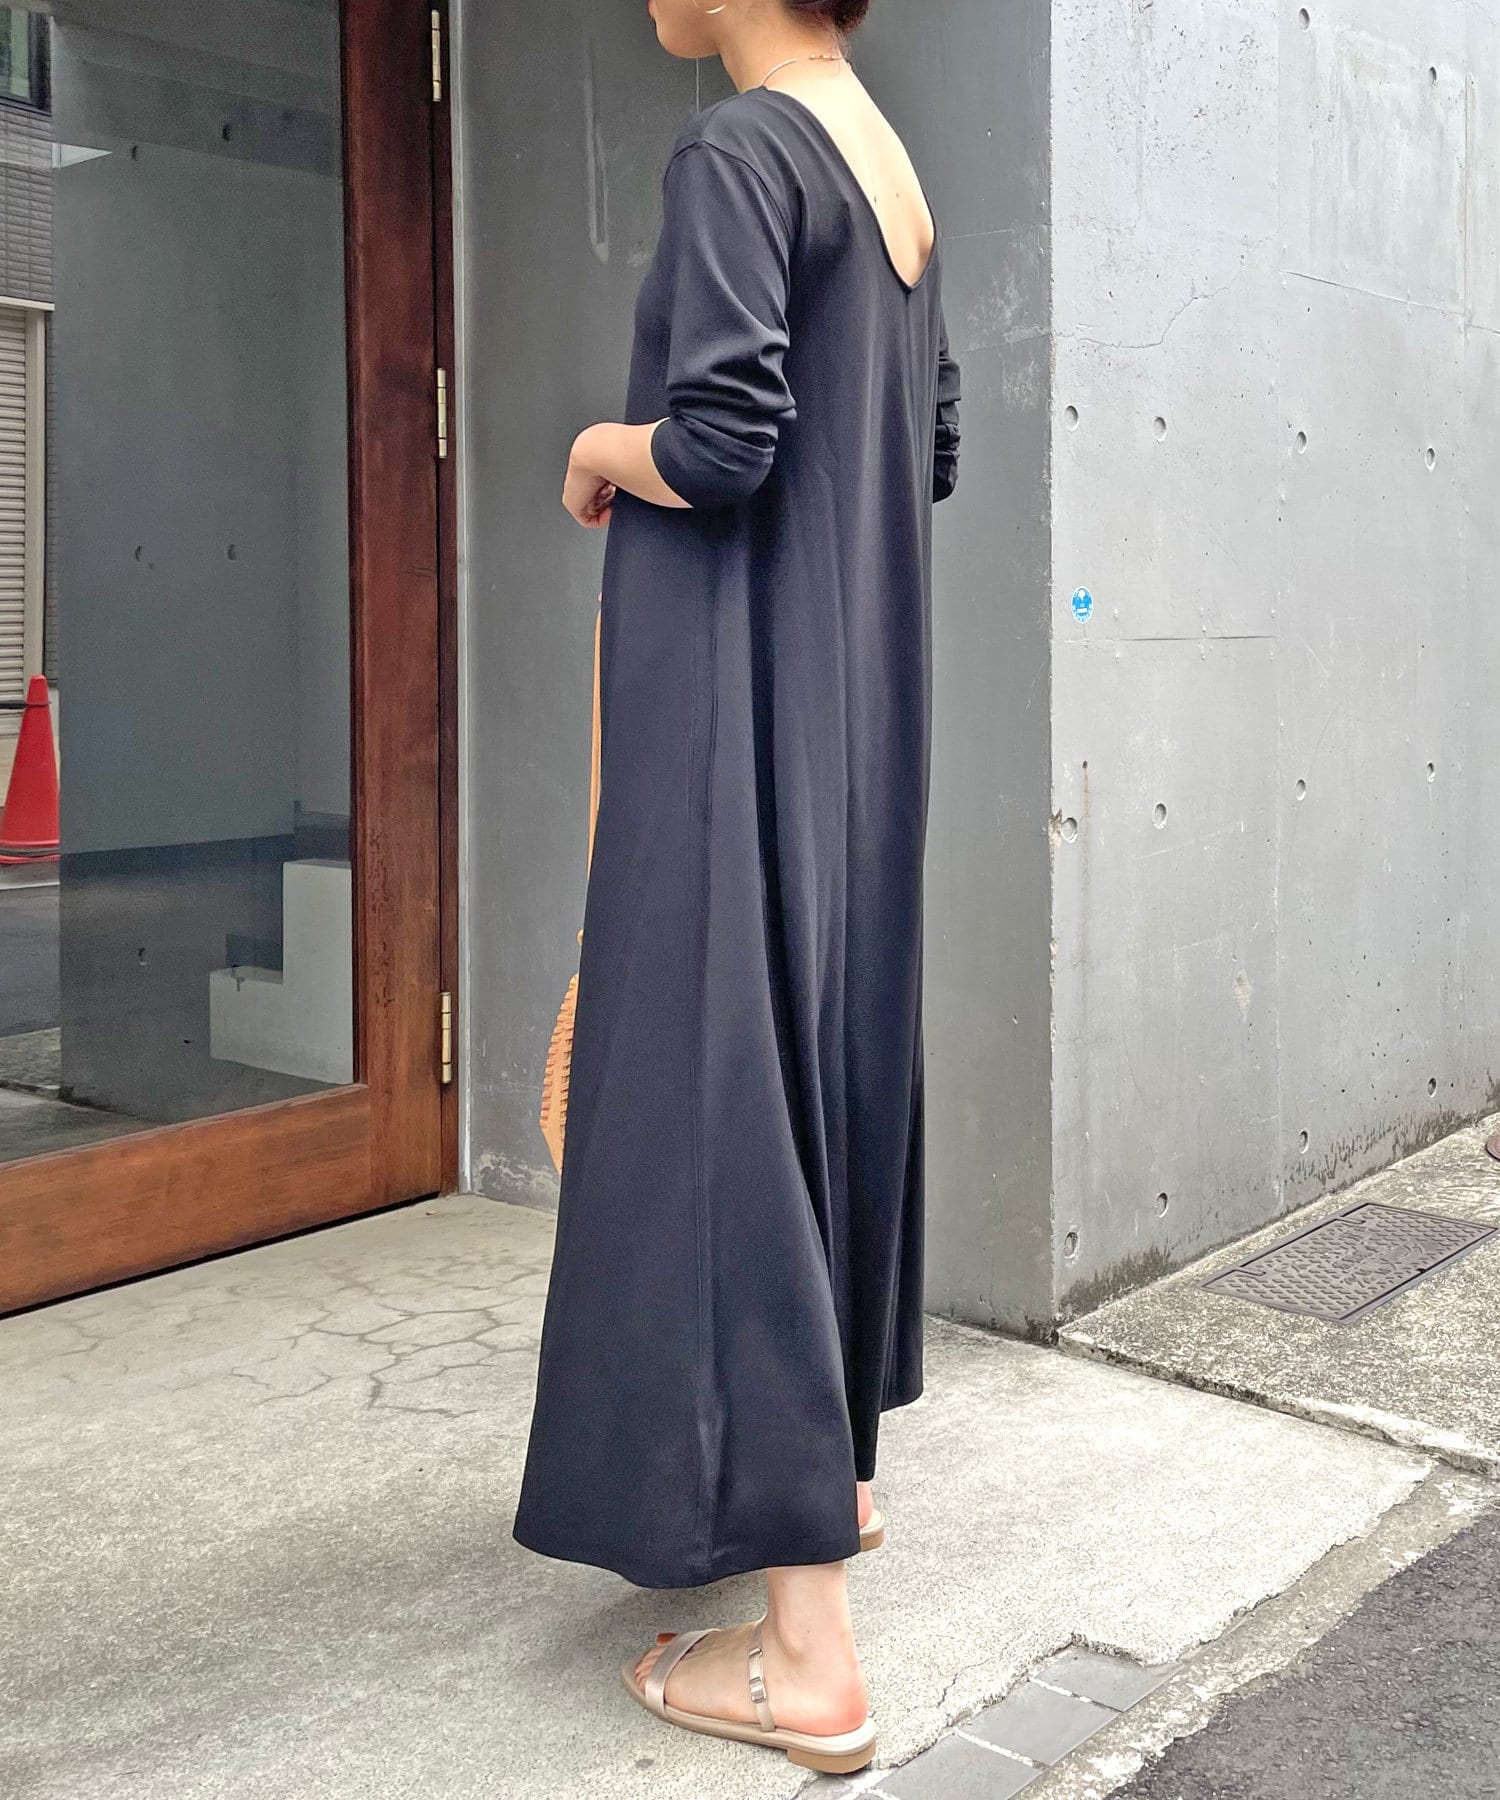 Omekashi(オメカシ) Önf(オンフ) カットジョーゼットドレス【着用動画&解説あり】